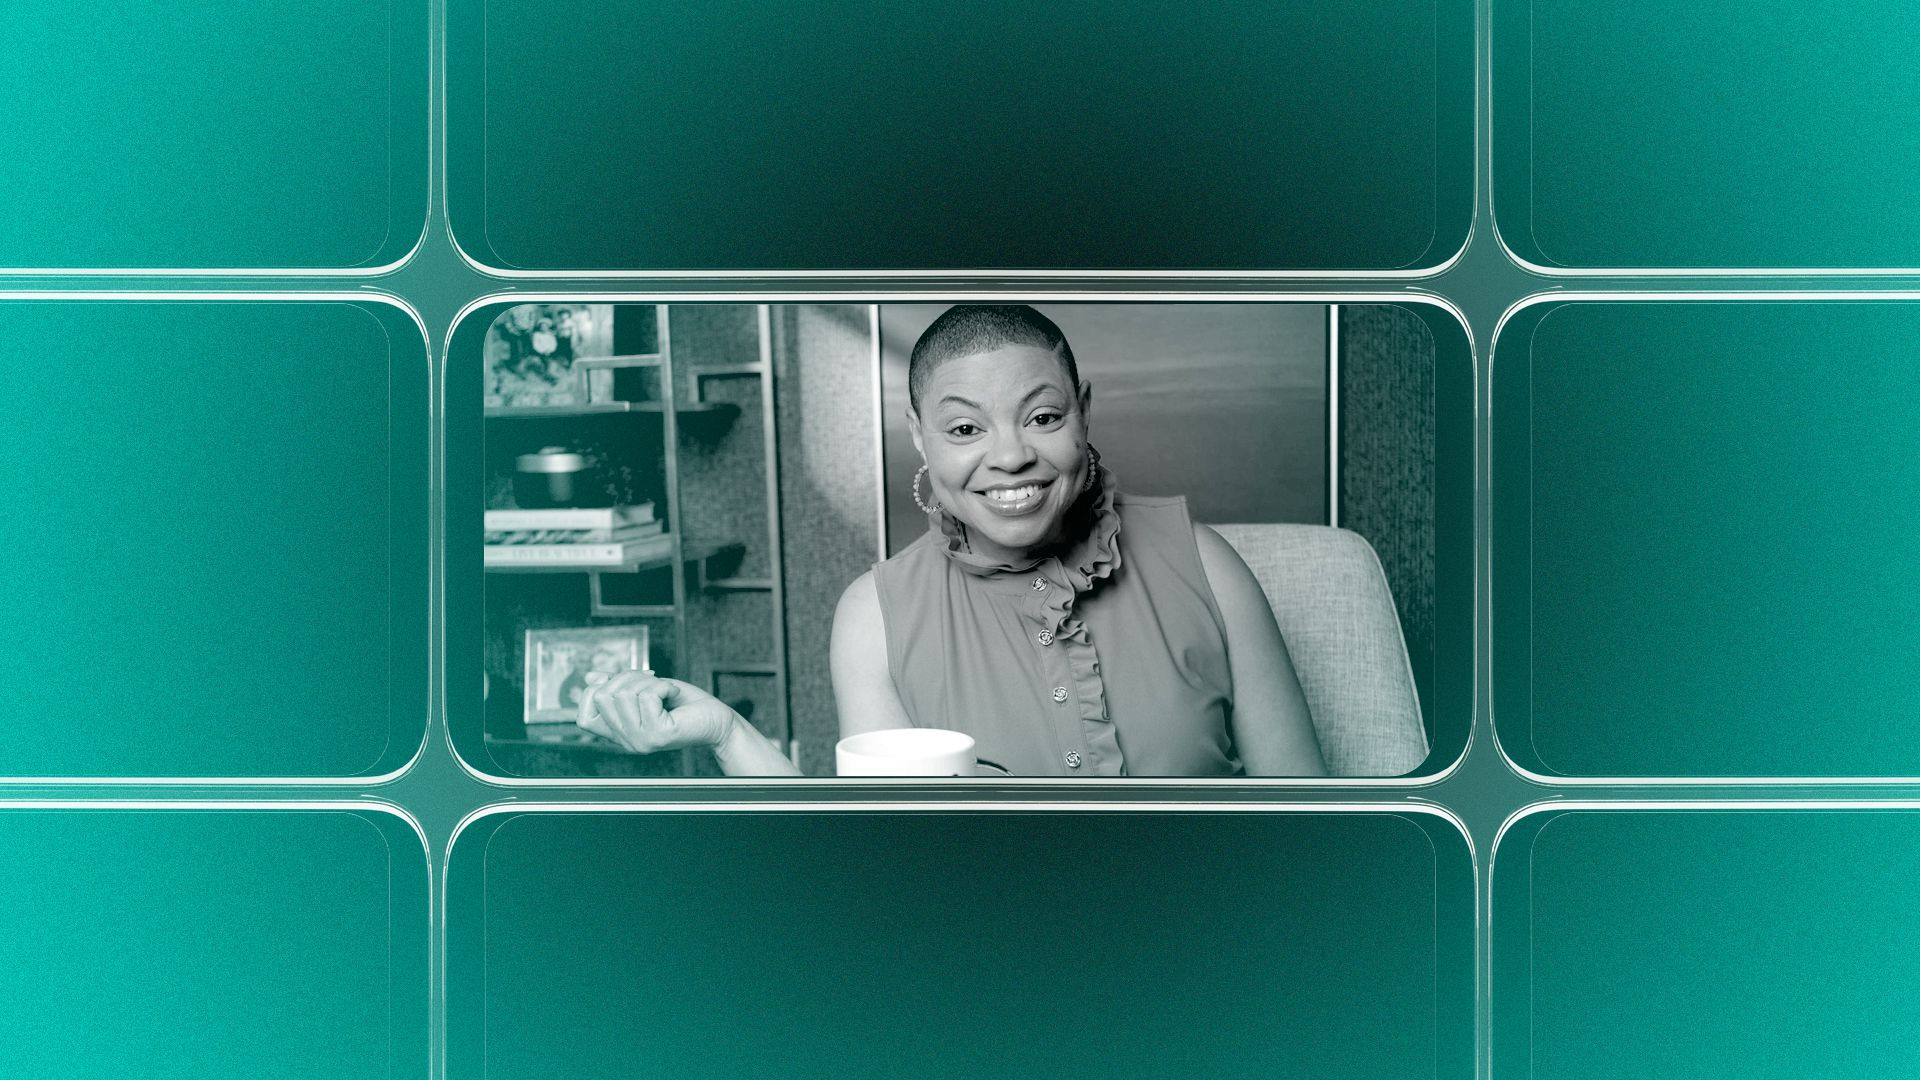 An image of Sheletta Brundidge